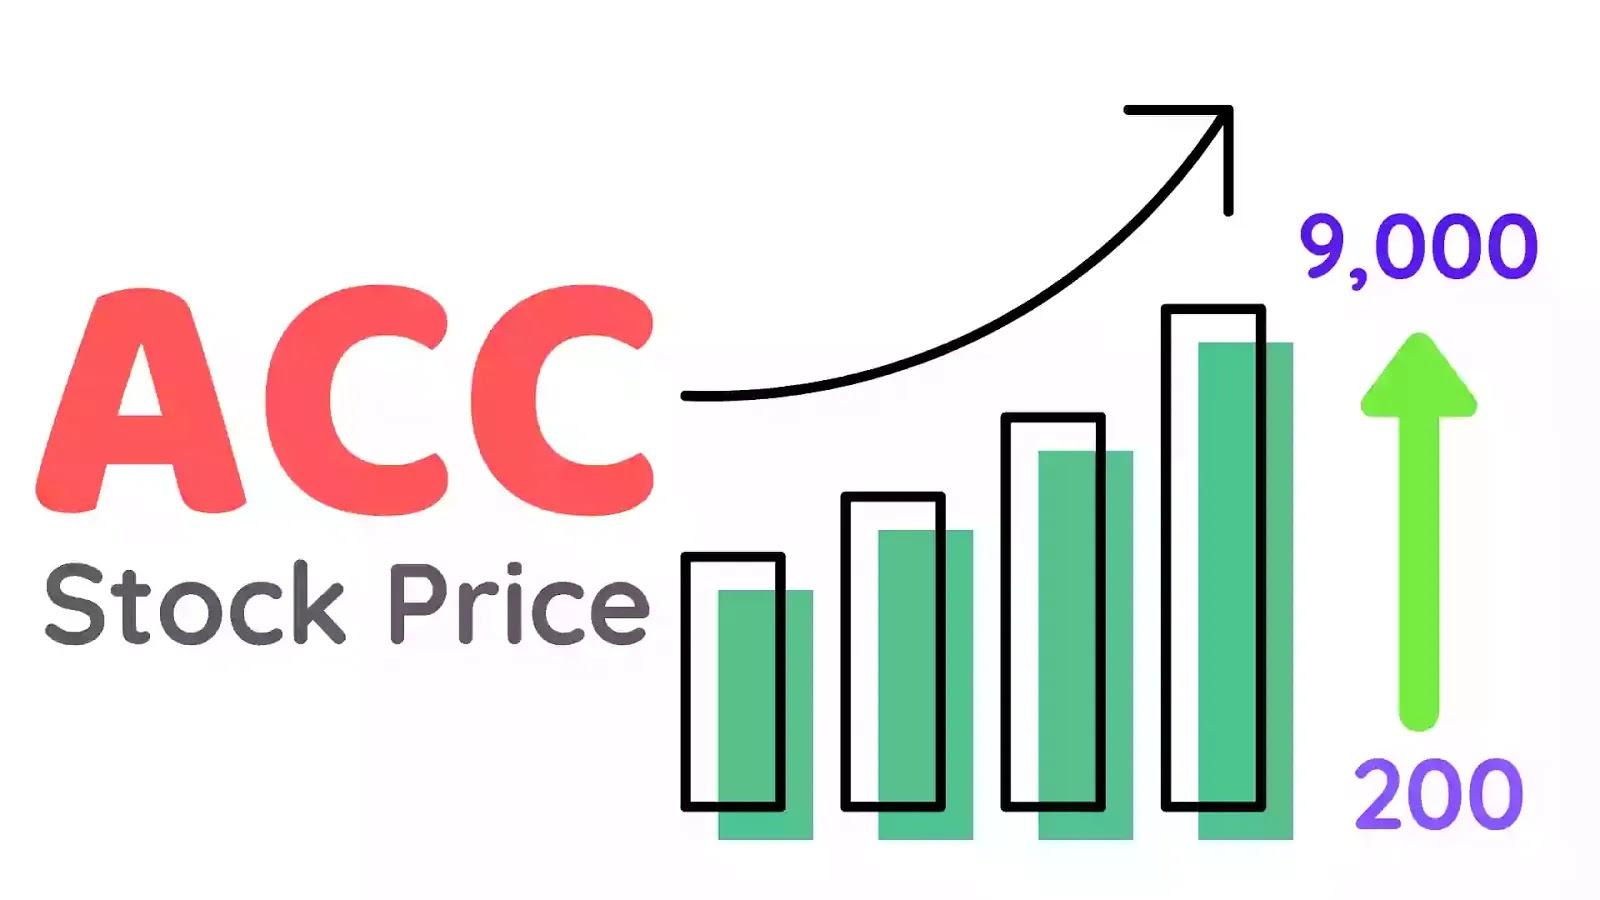 ACC Stock Price in 1992